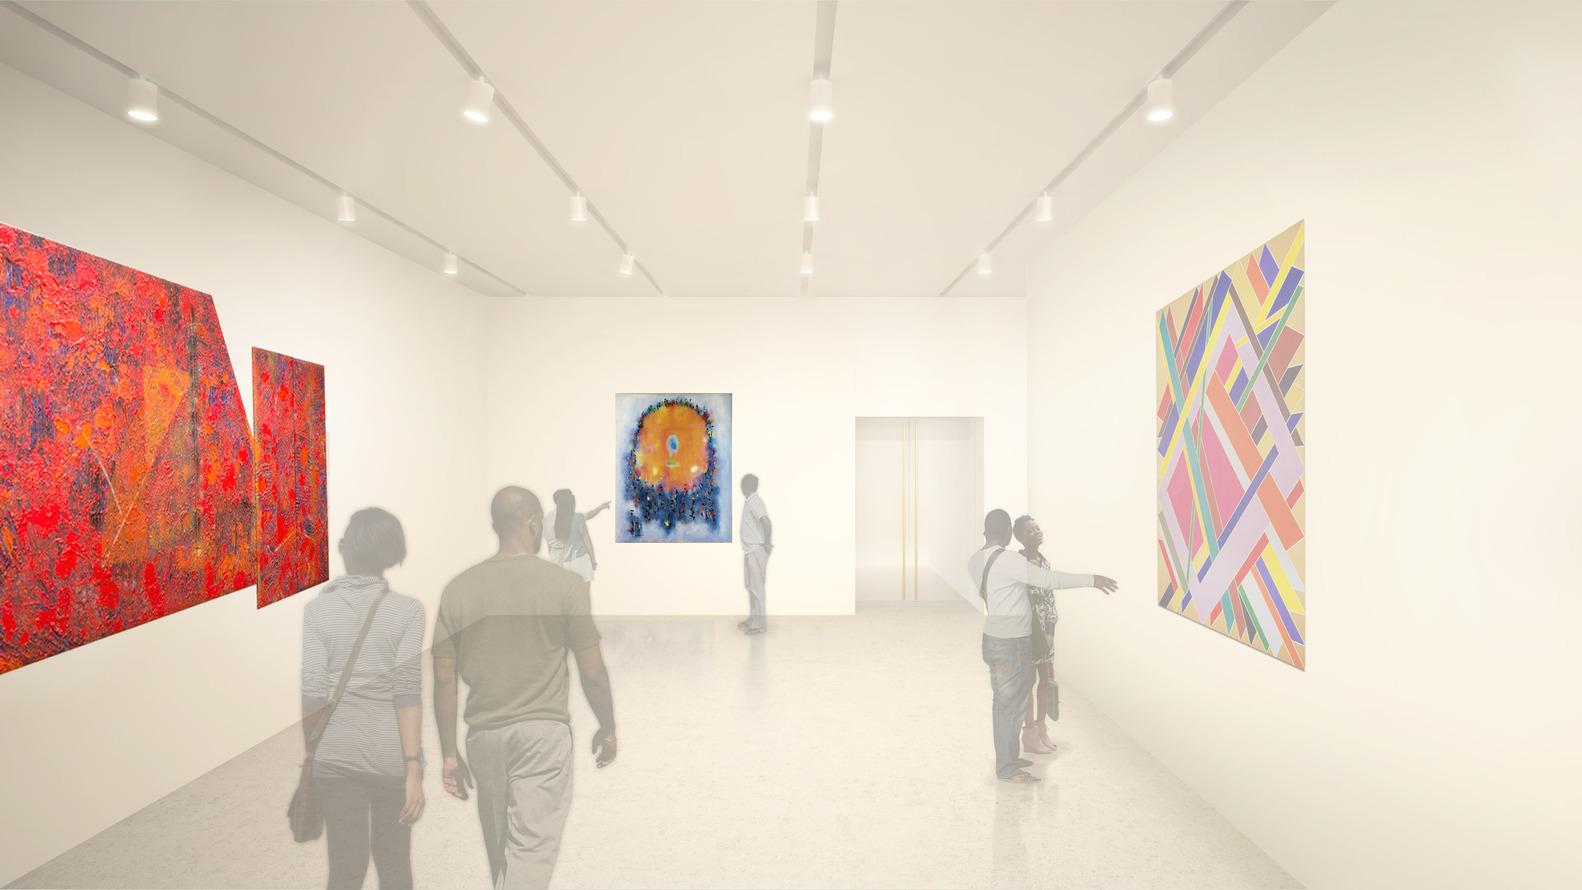 Adjaye Associates' Studio Museum Moves Forward Toward Fall Groundbreaking,Gallery. Image Courtesy of Adjaye Associates